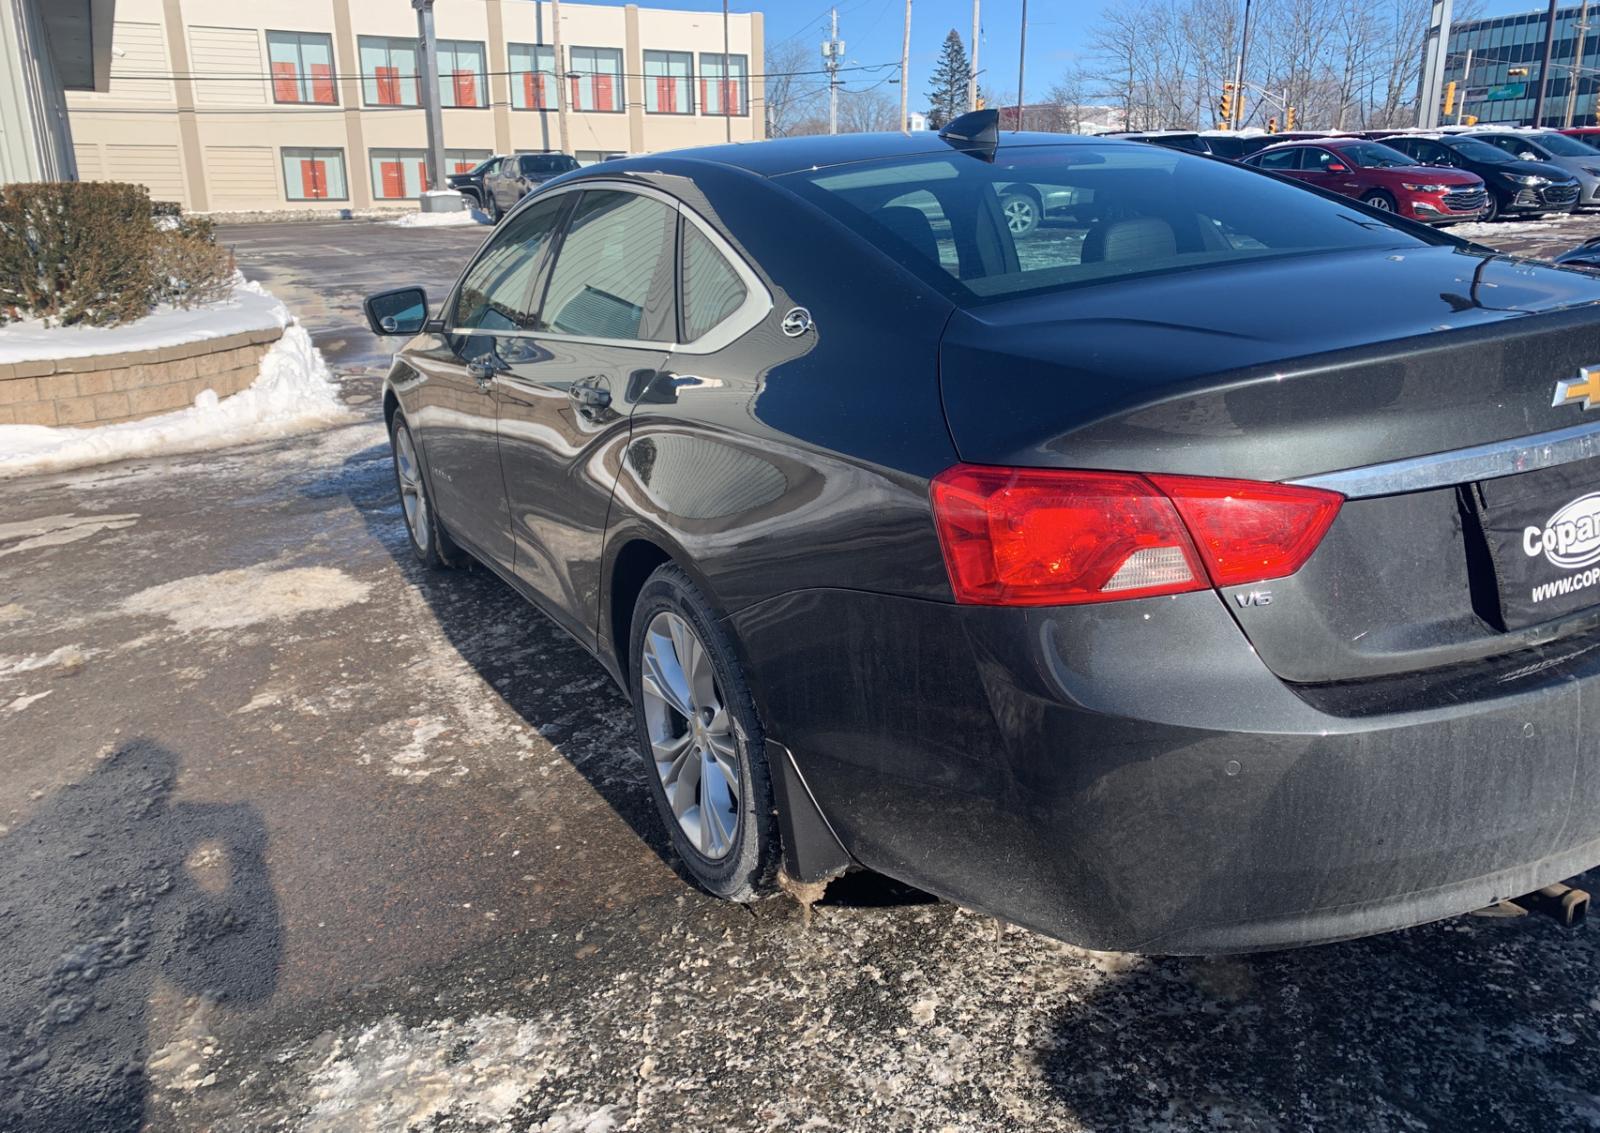 2G1125S37F9185464 - 2015 Chevrolet Impala Lt 3.6L [Angle] View